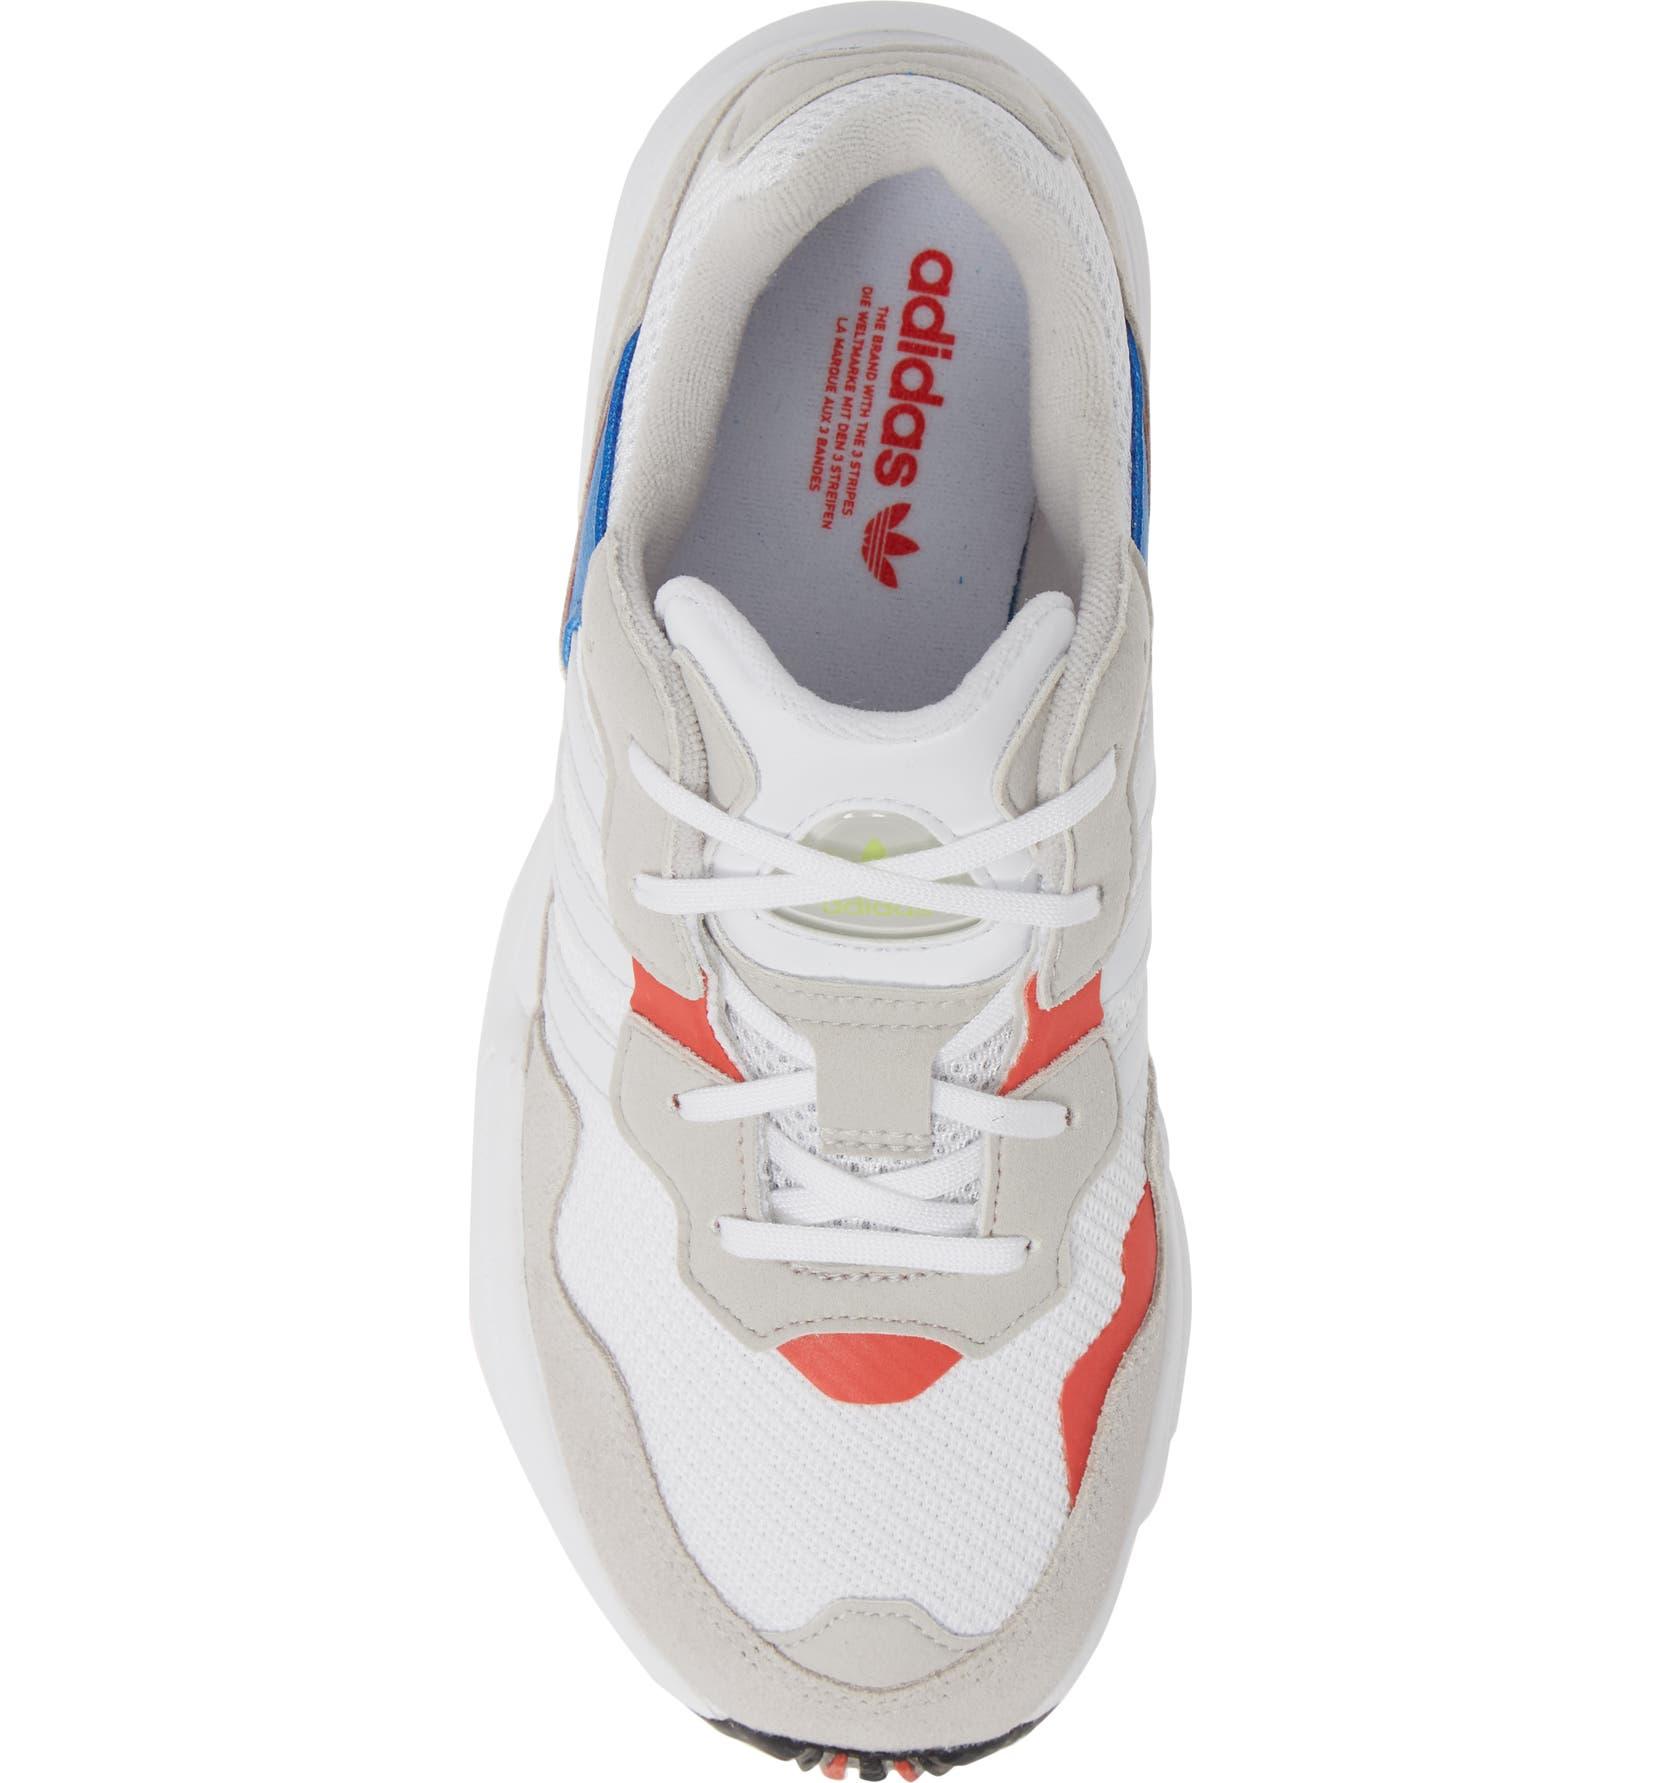 san francisco 23bc3 74718 adidas Yung-96 Sneaker (Baby, Walker, Toddler, Little Kid   Big Kid)    Nordstrom